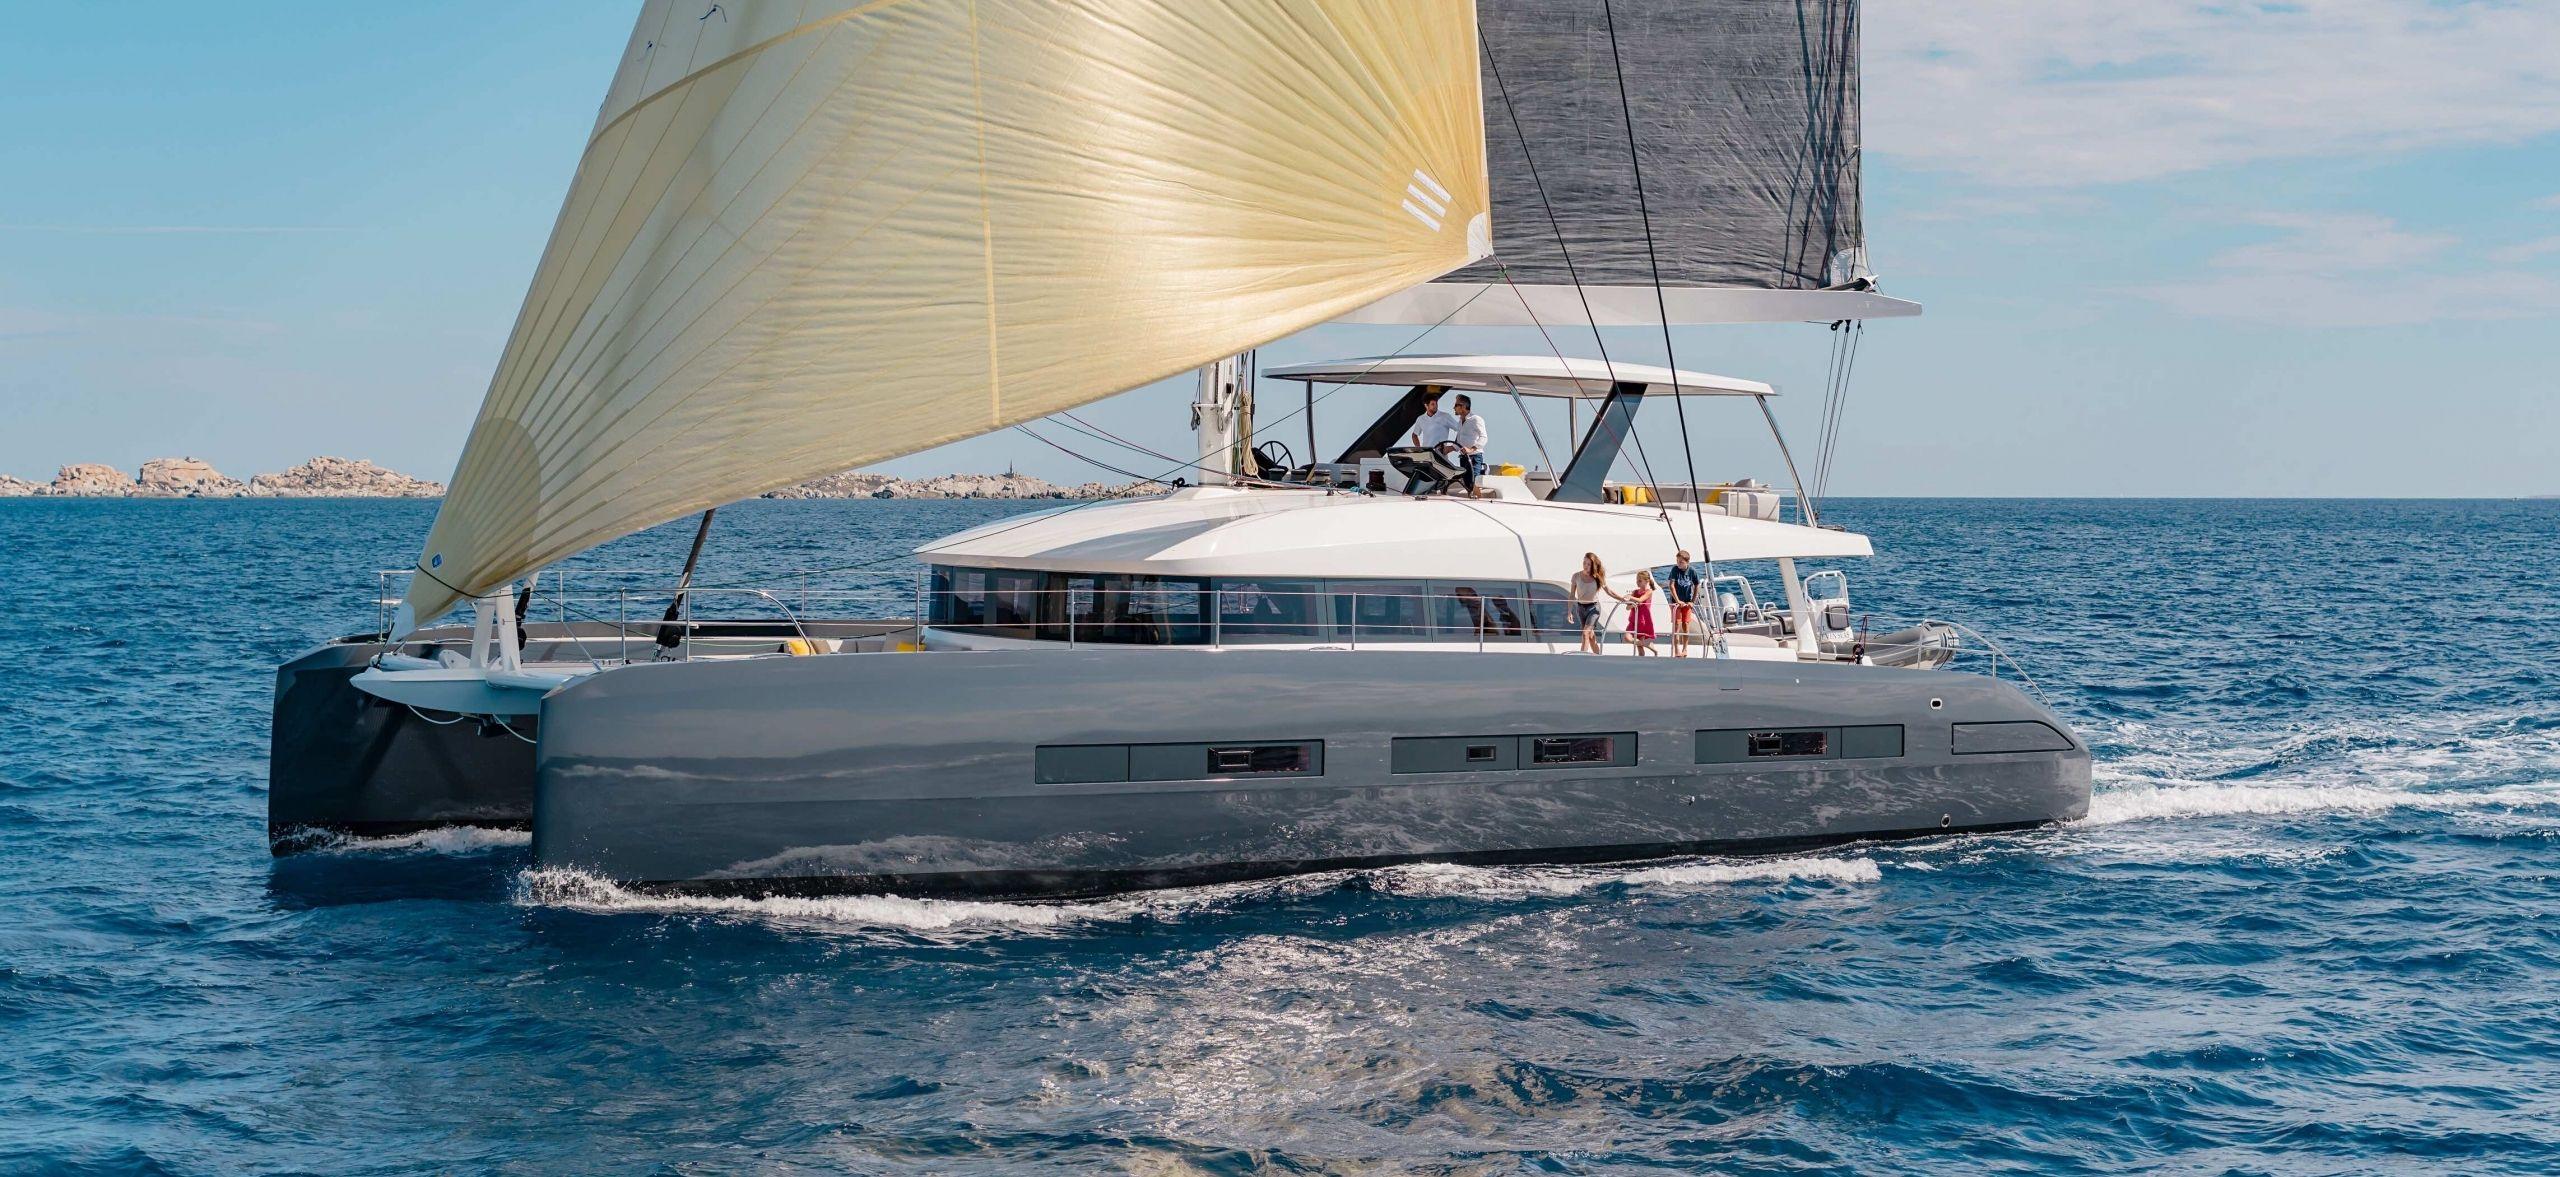 Lagoon Catamaran - Seventy 7 - Boats for sale